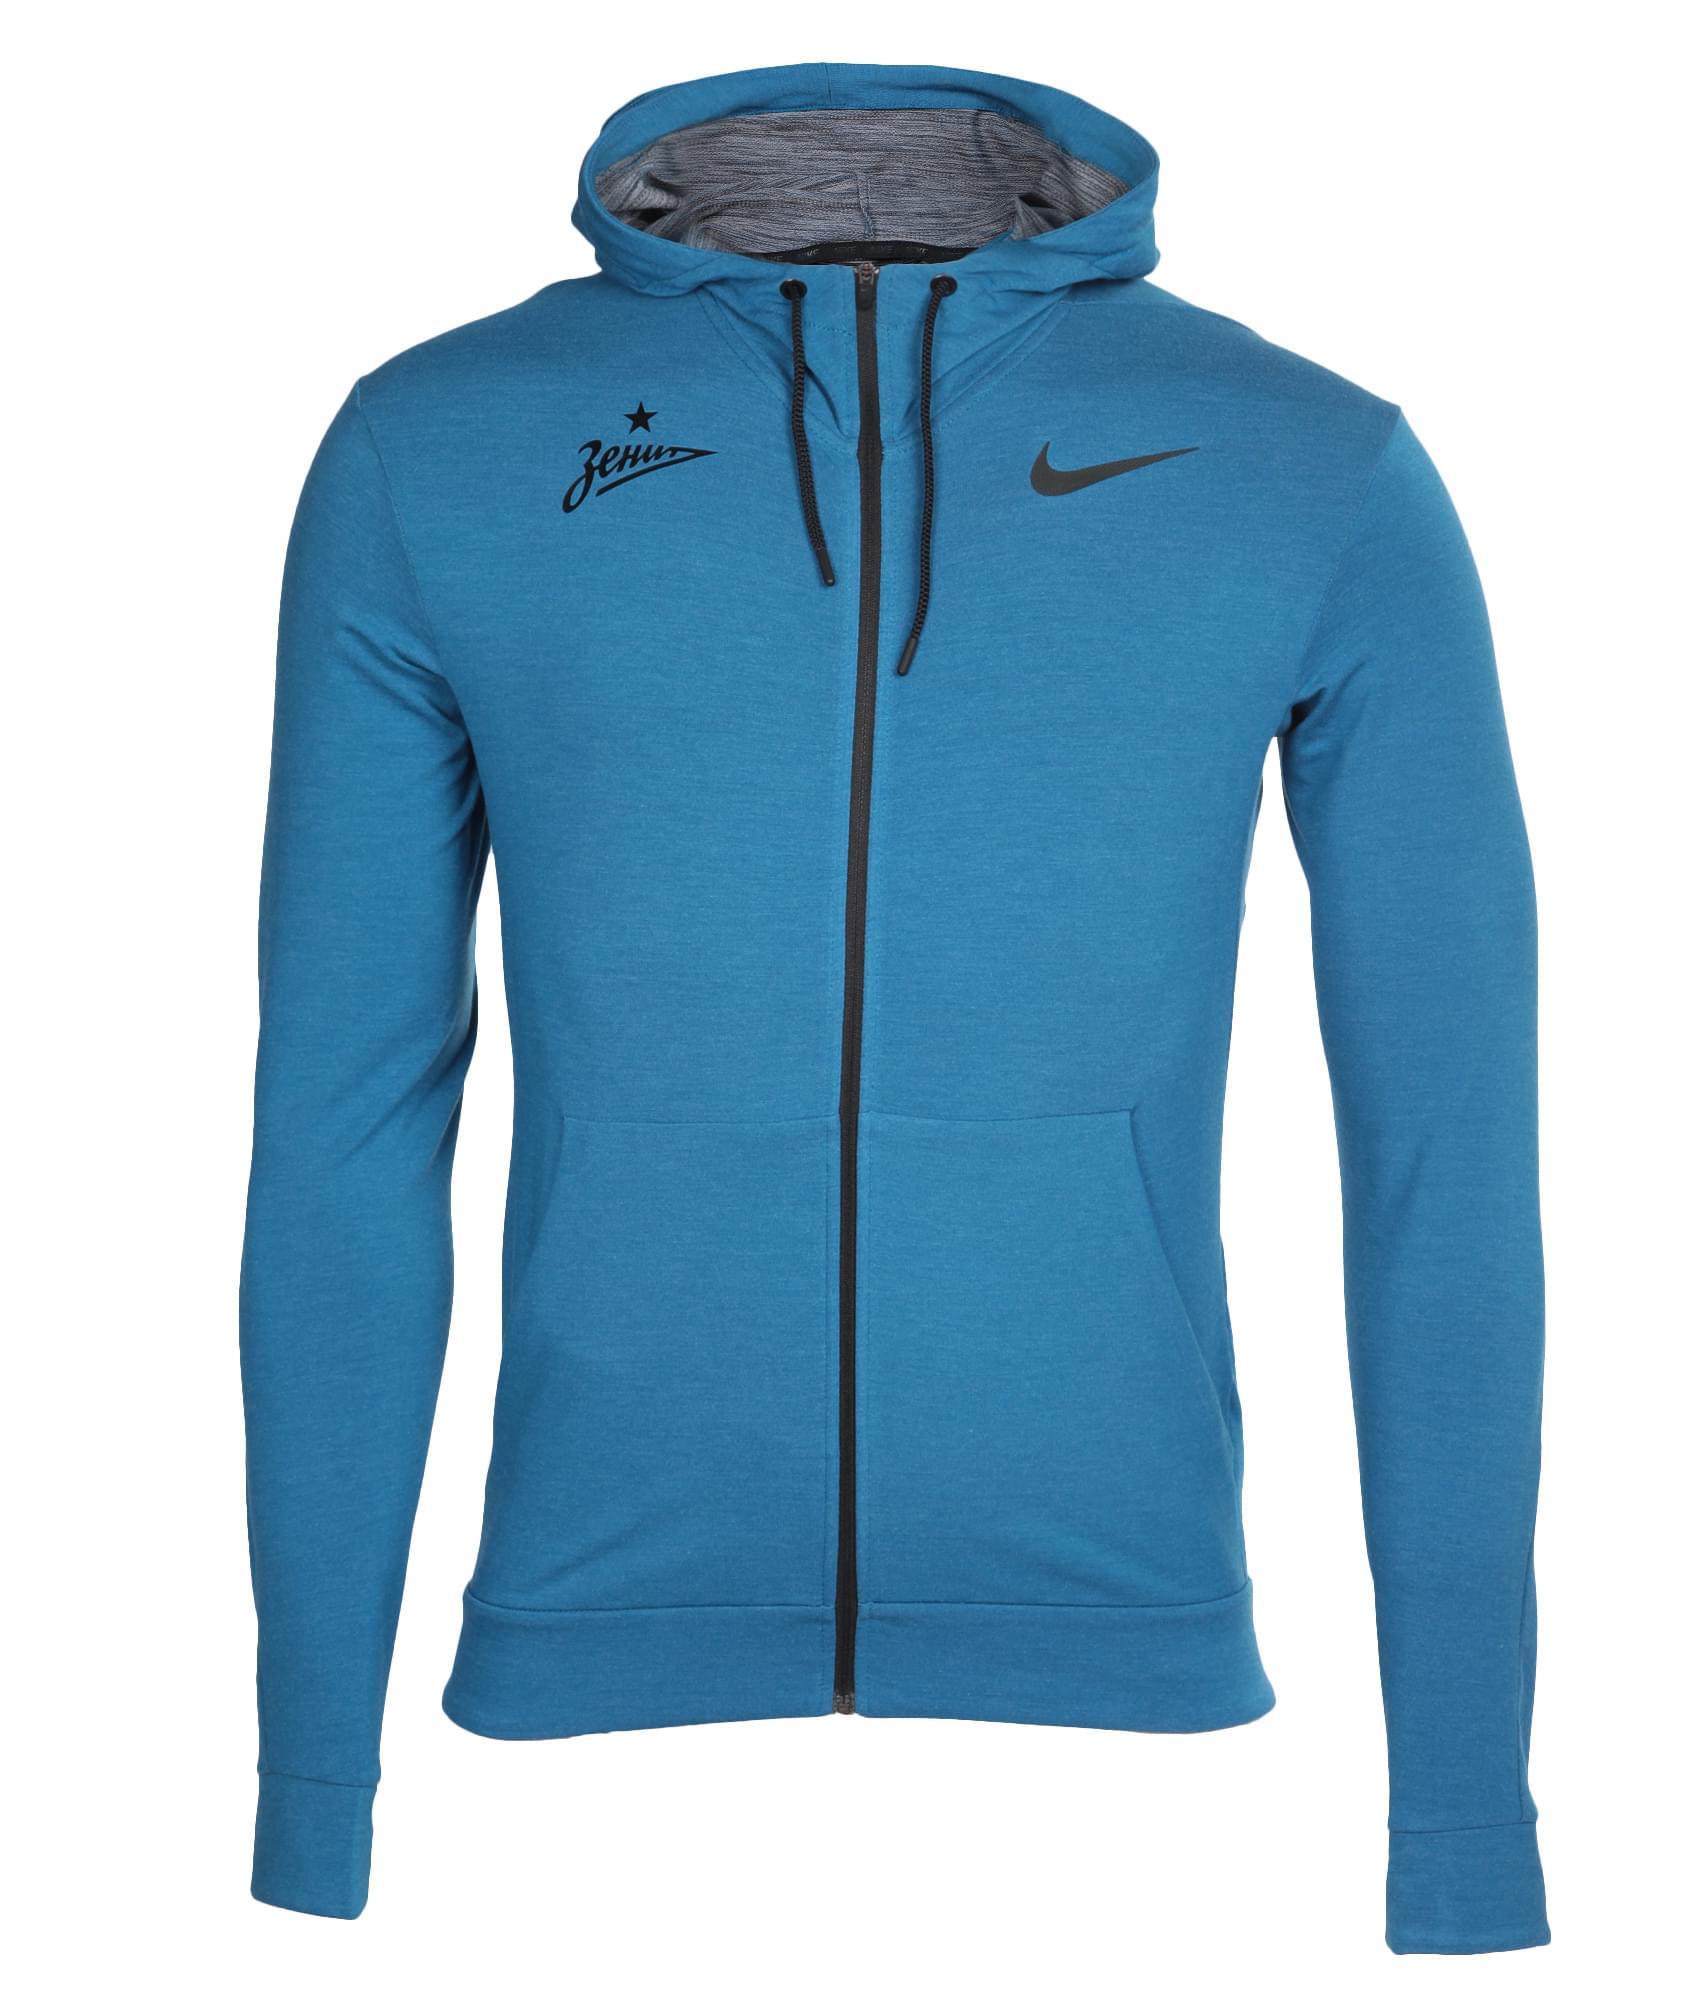 все цены на  Толстовка мужская Nike, Цвет-Синий, Размер-L  в интернете